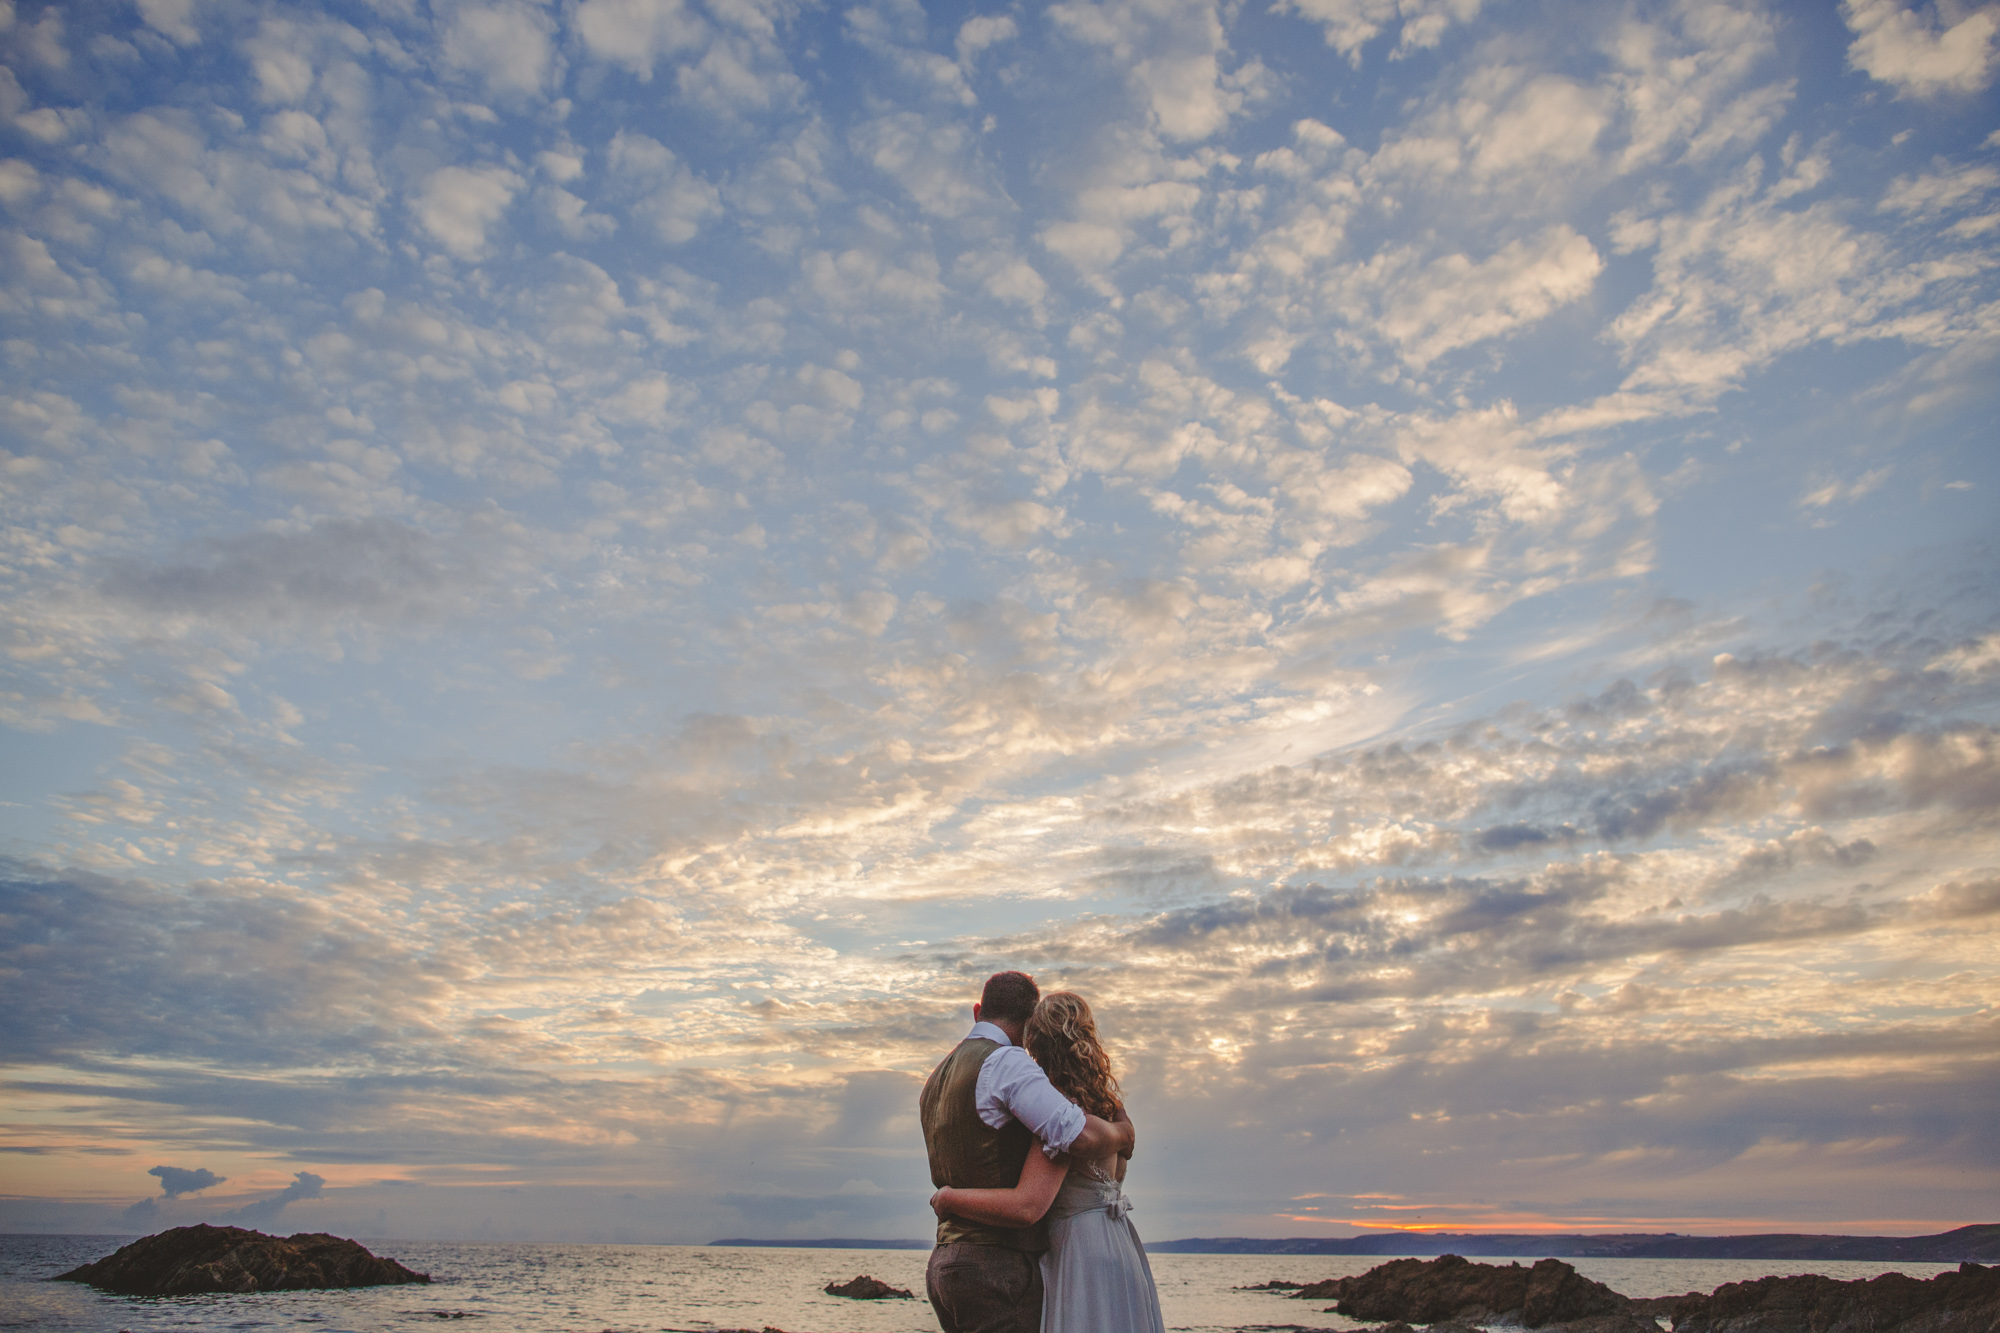 cornwall-alternative-wedding-photographer-beach-wedding-19.jpg